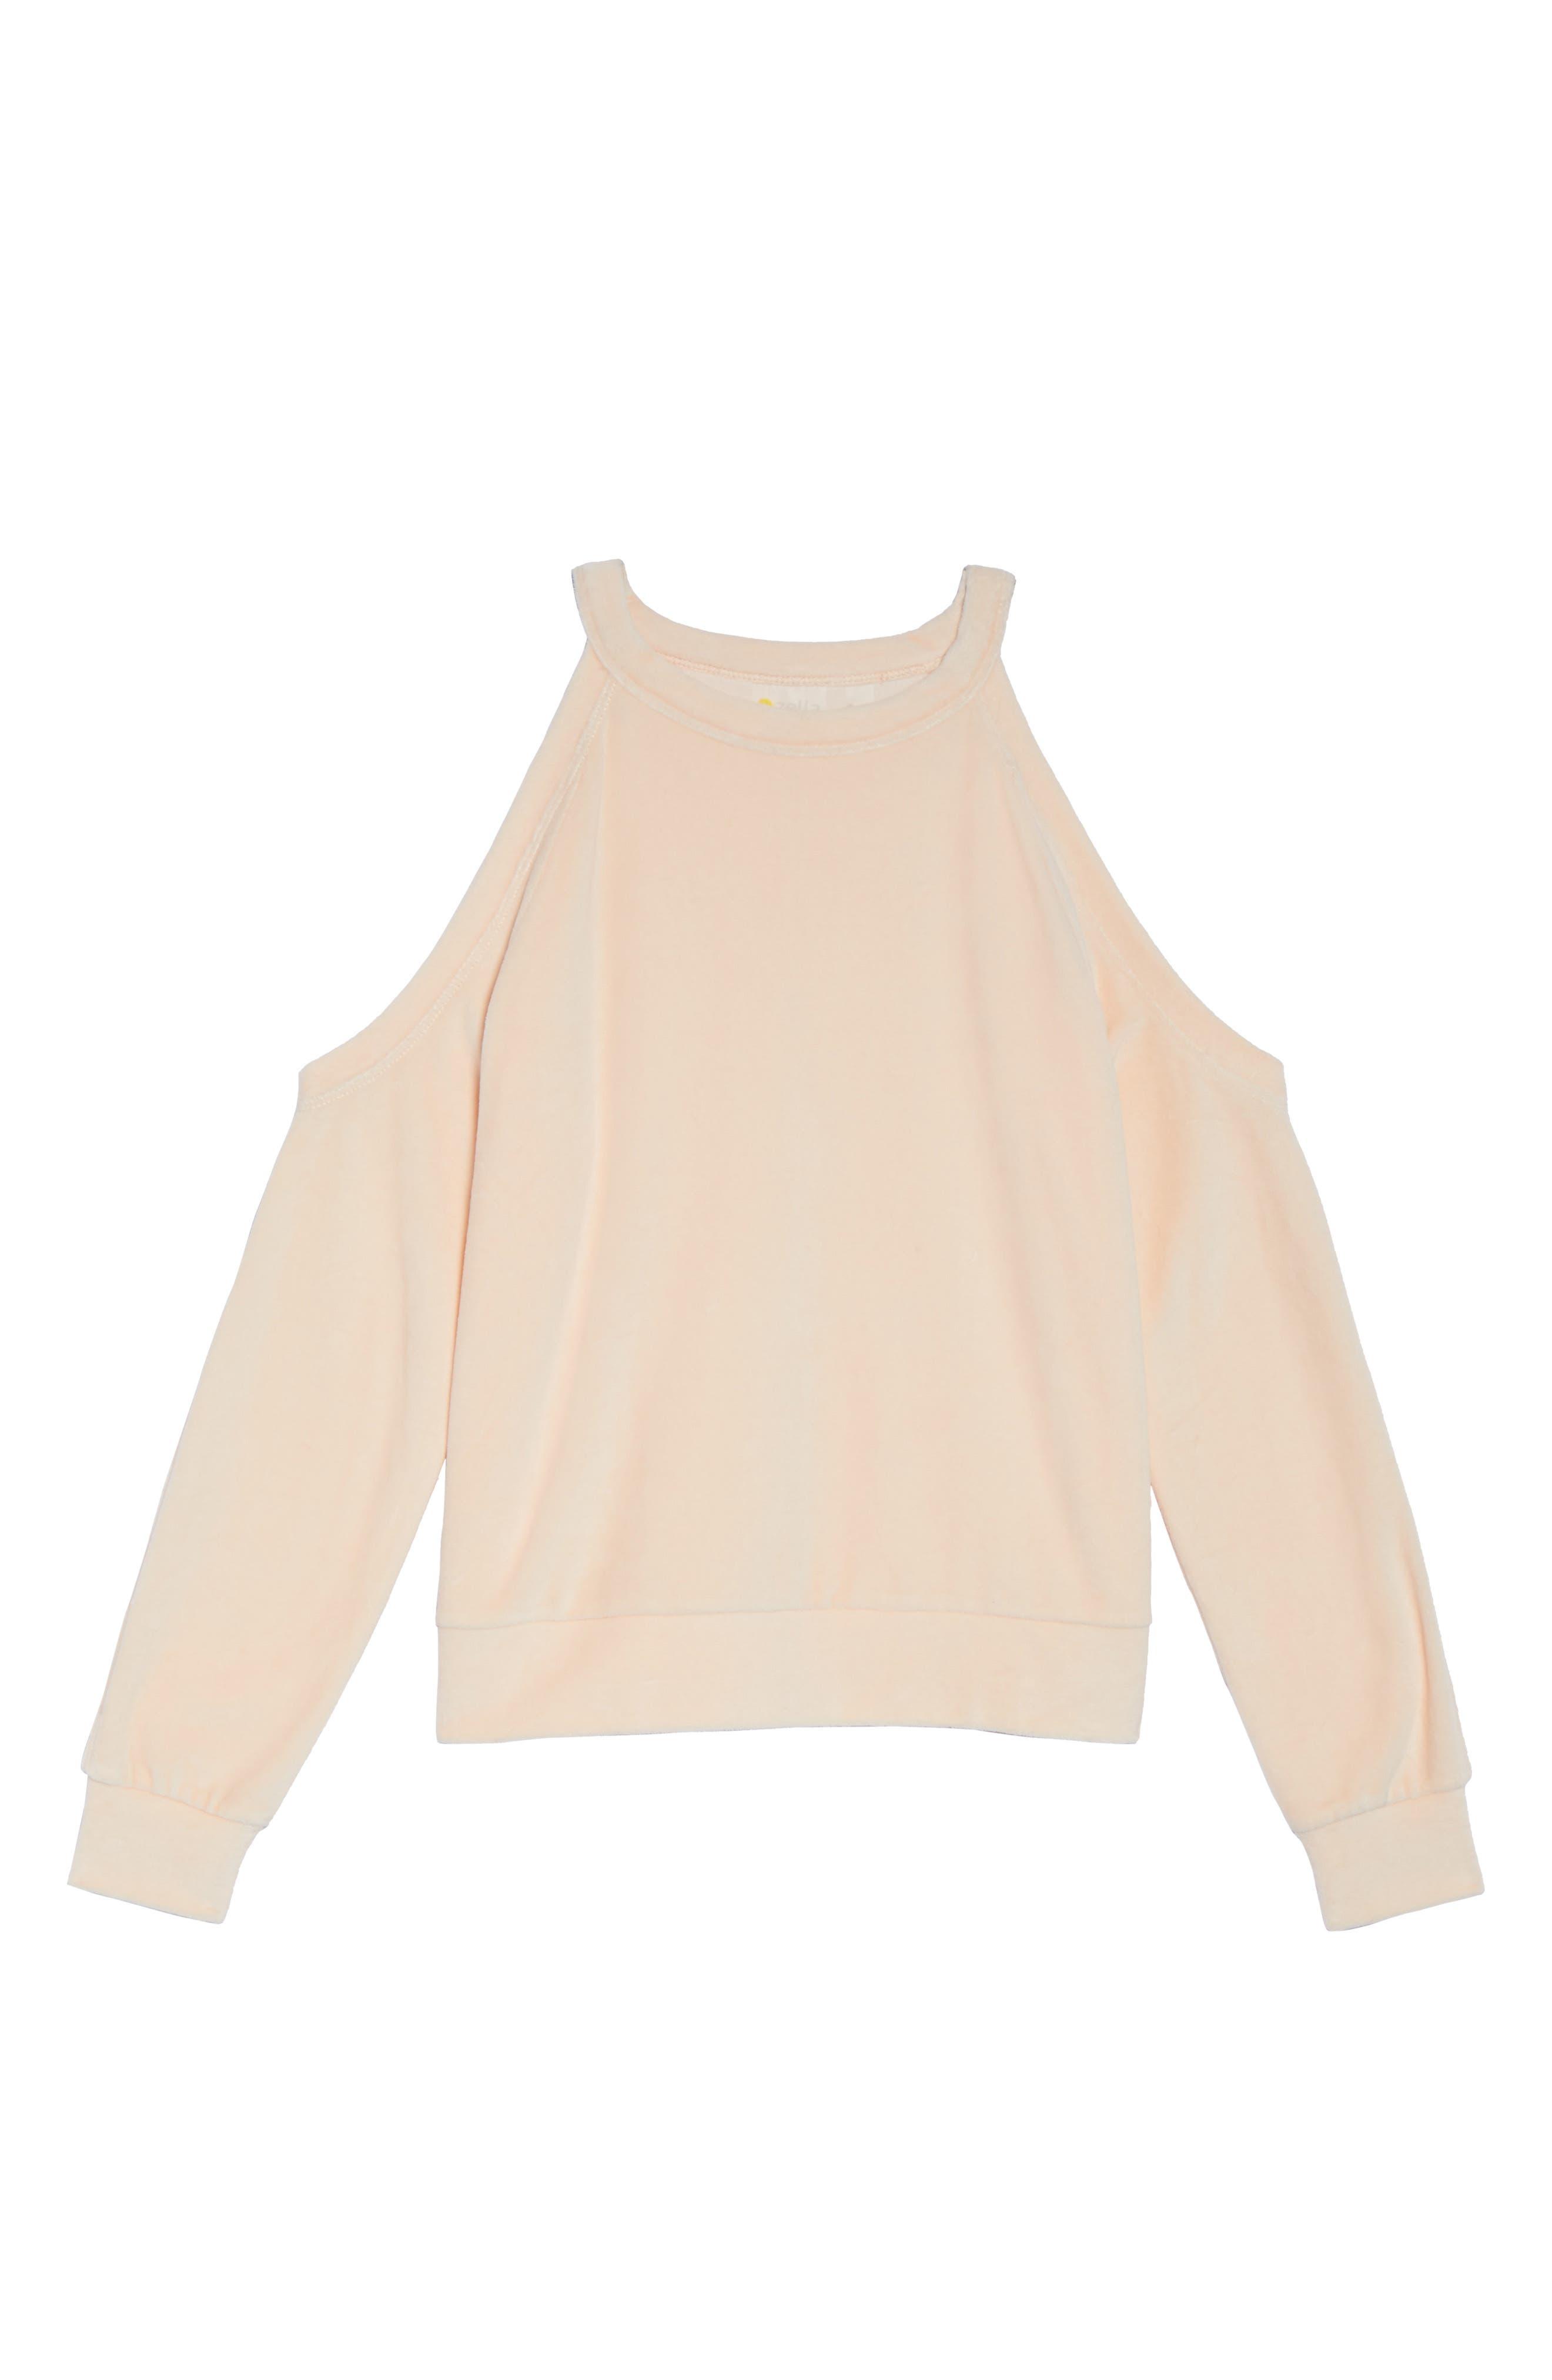 Cara Velour Cold Shoulder Top,                             Alternate thumbnail 7, color,                             Pink Scallop